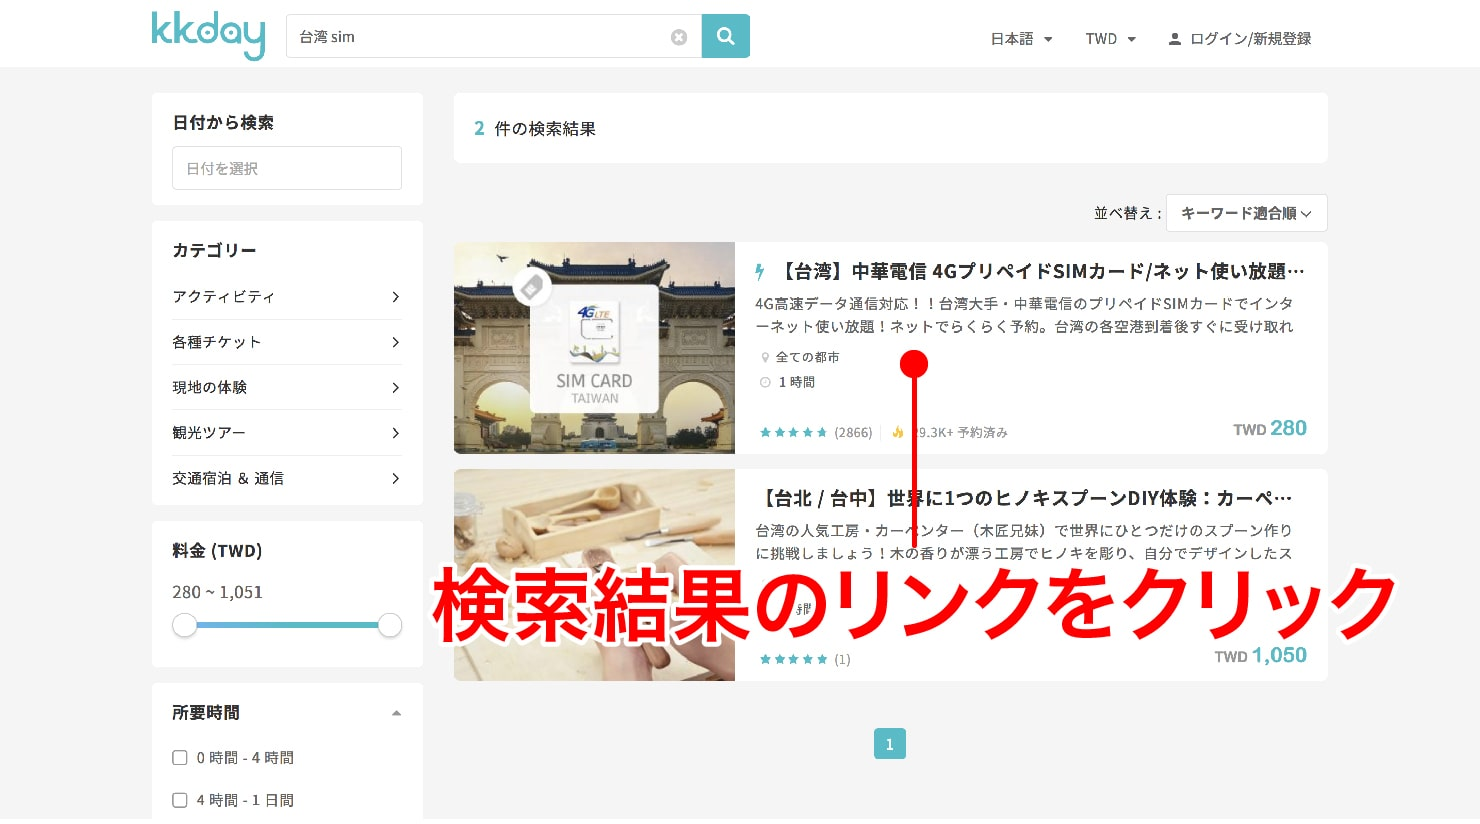 KKdayでの「中華電信プリペイドSIMカード」予約手順_1